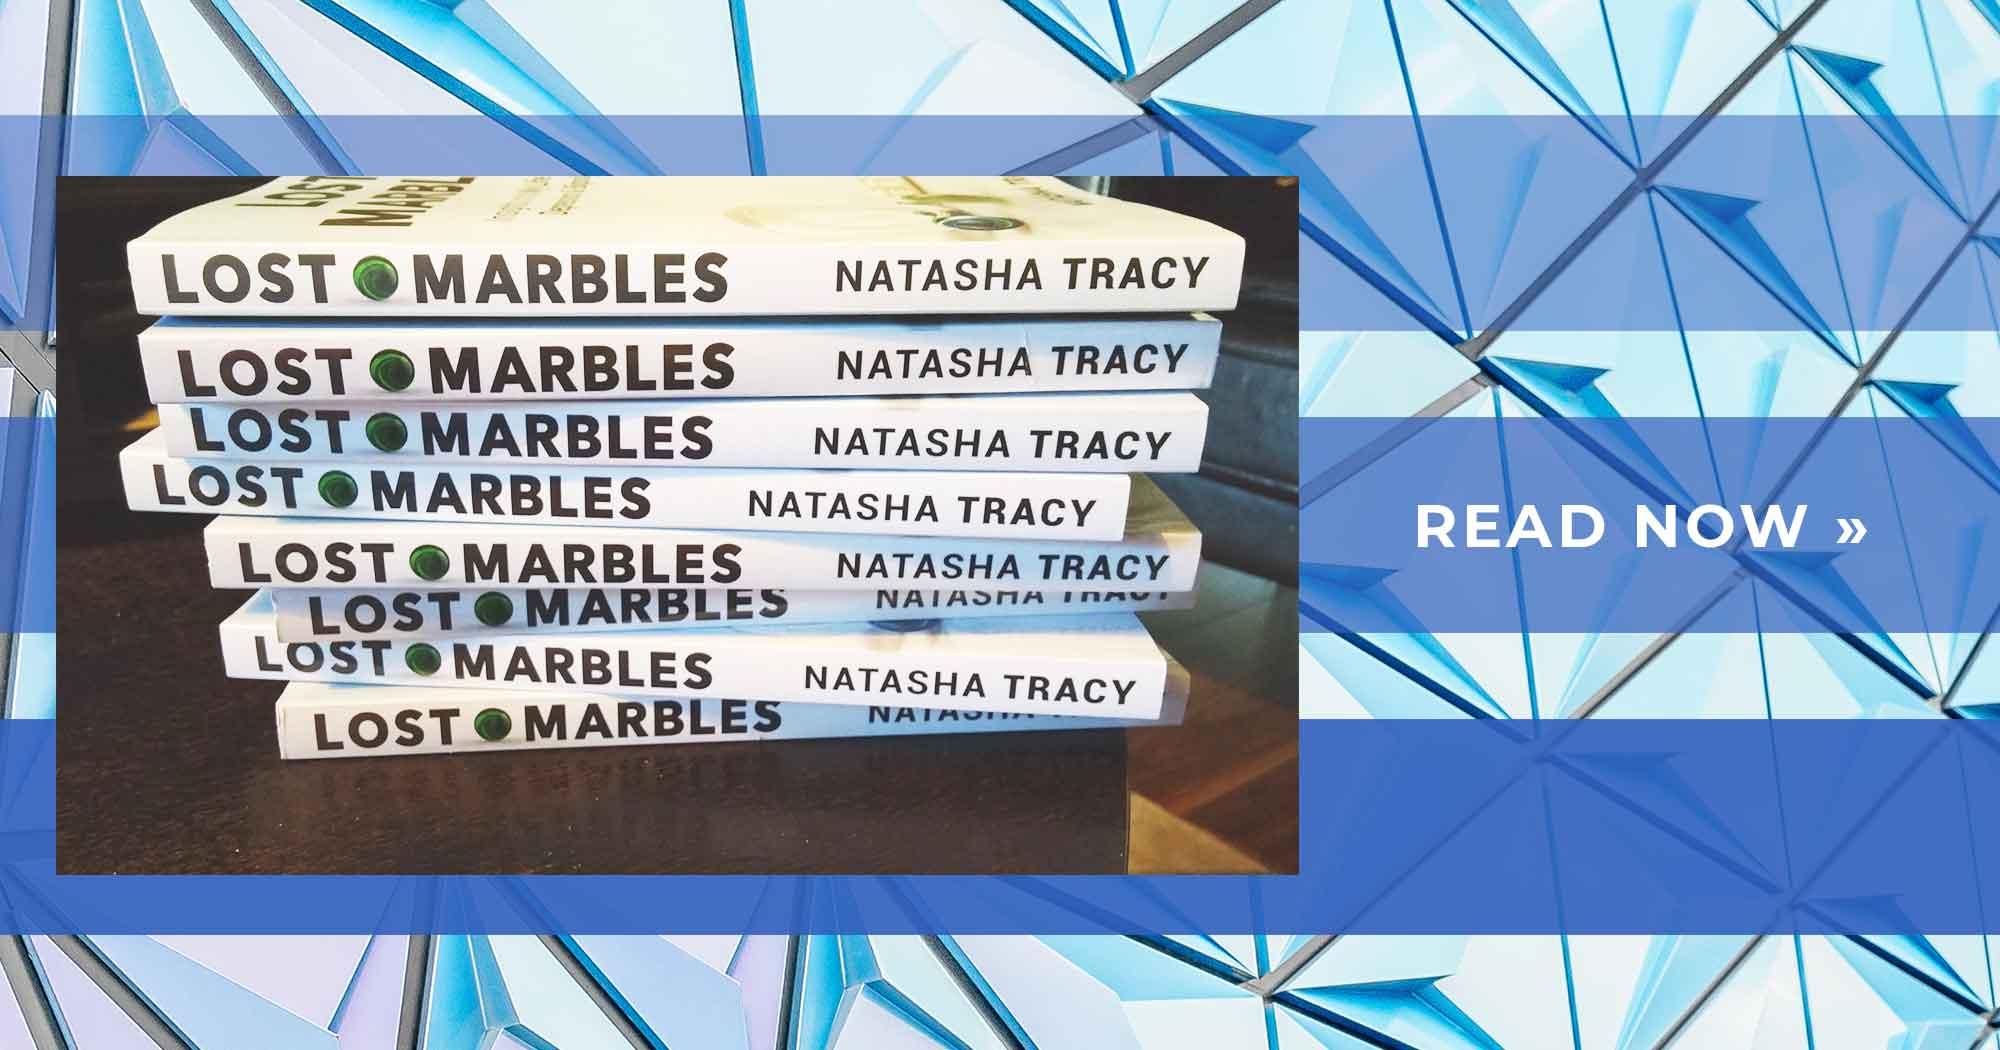 lost marbles bipolar book natasha tracey